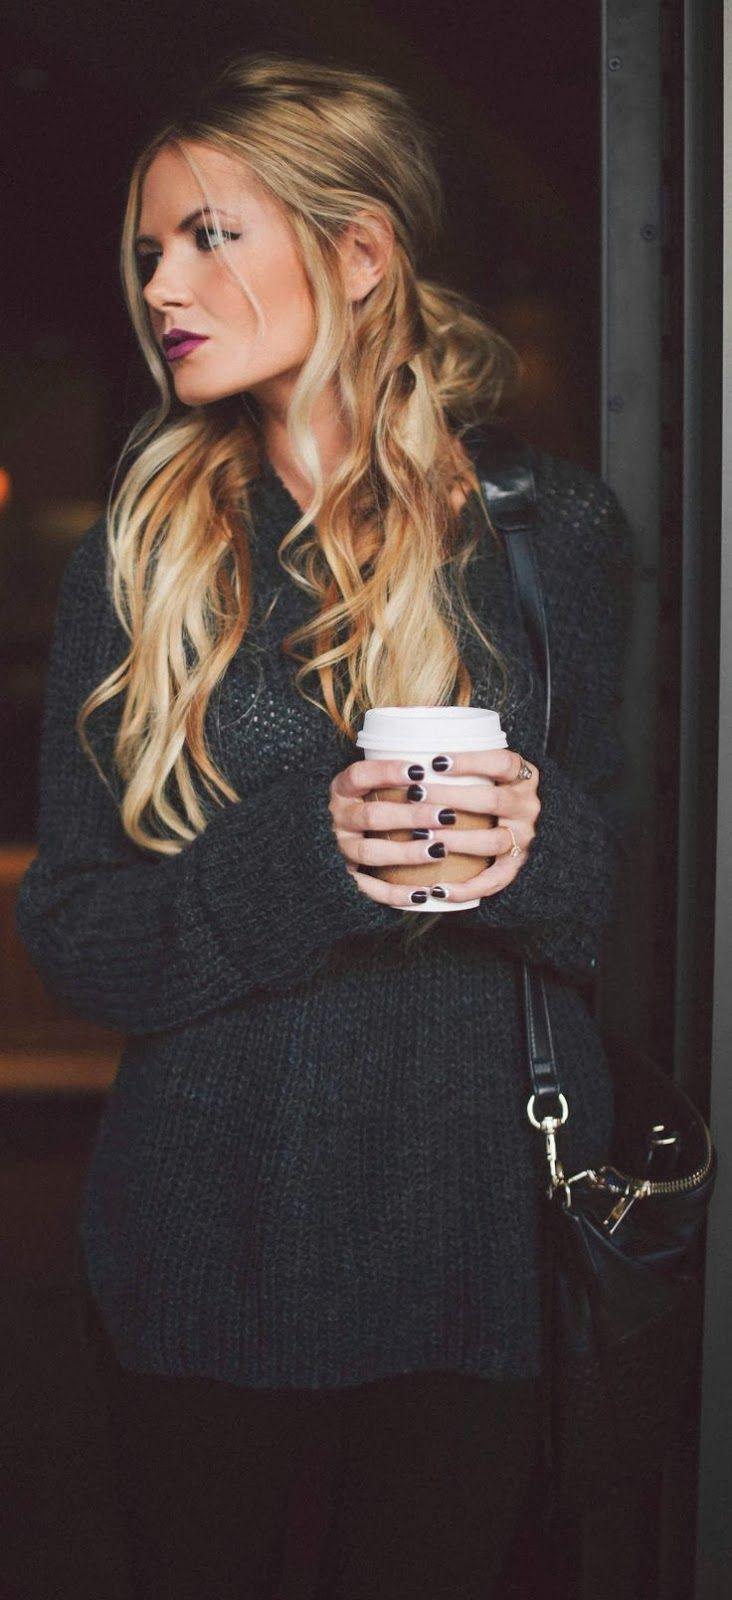 Sweater dress hairstyles for long dark hair